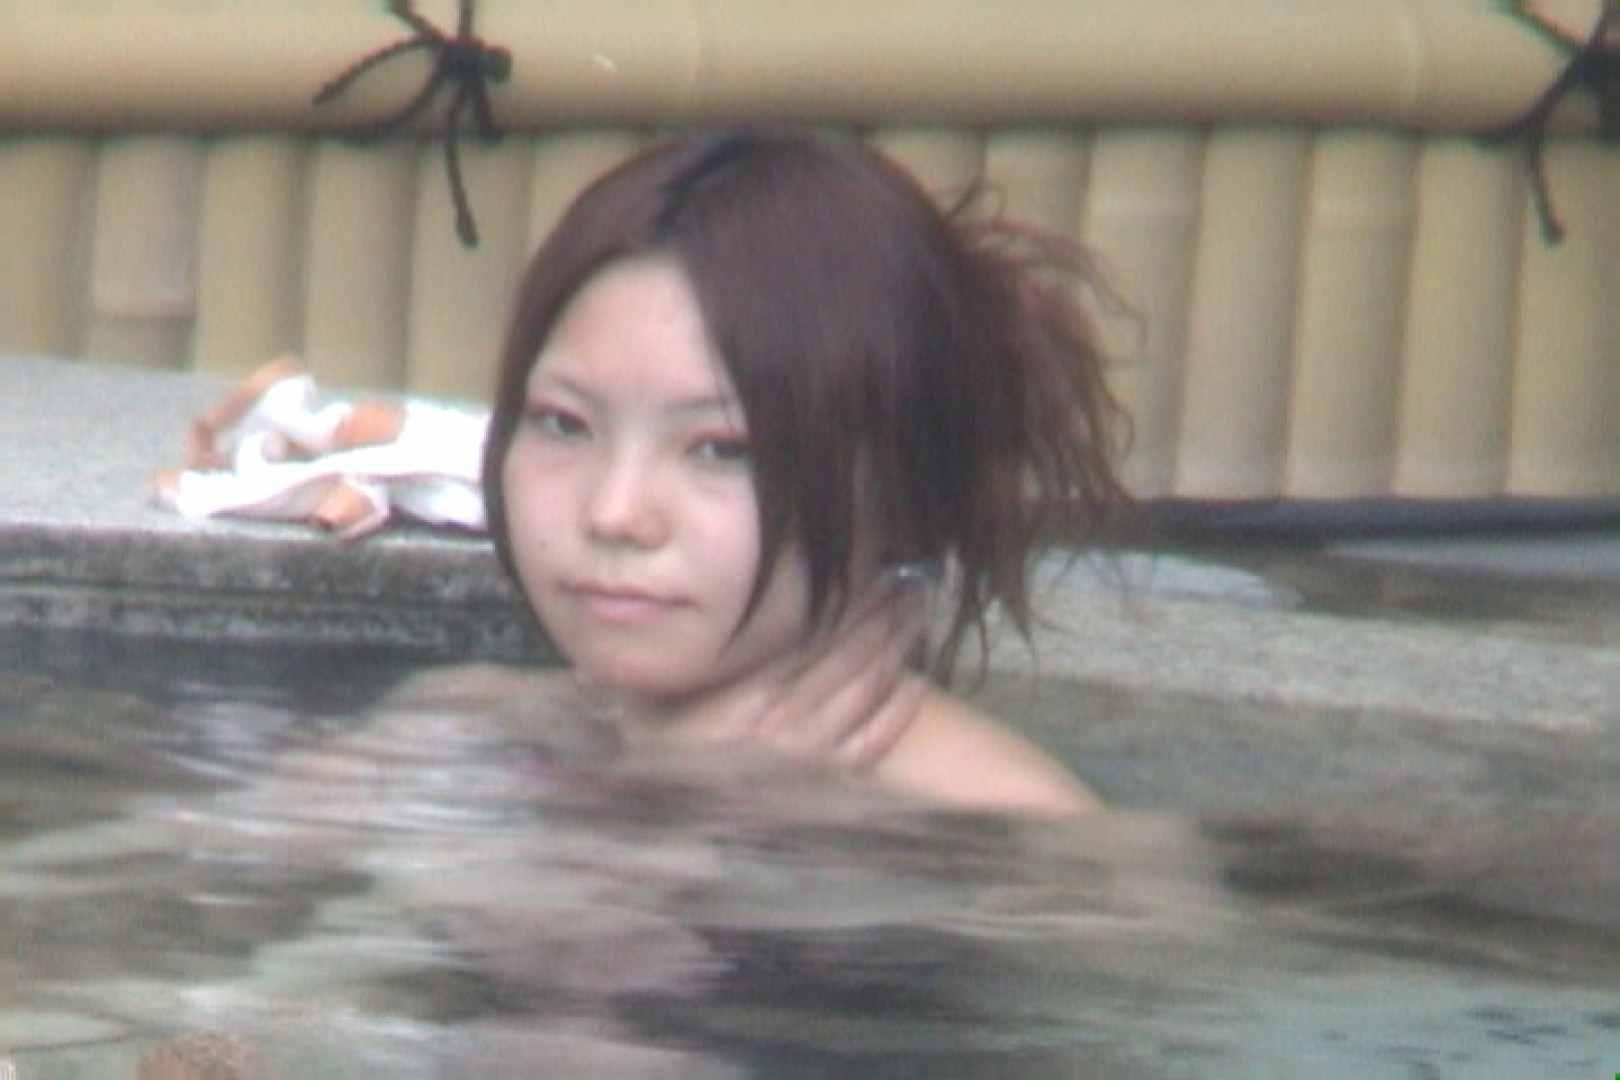 Aquaな露天風呂Vol.570 盗撮 のぞき動画画像 71枚 47